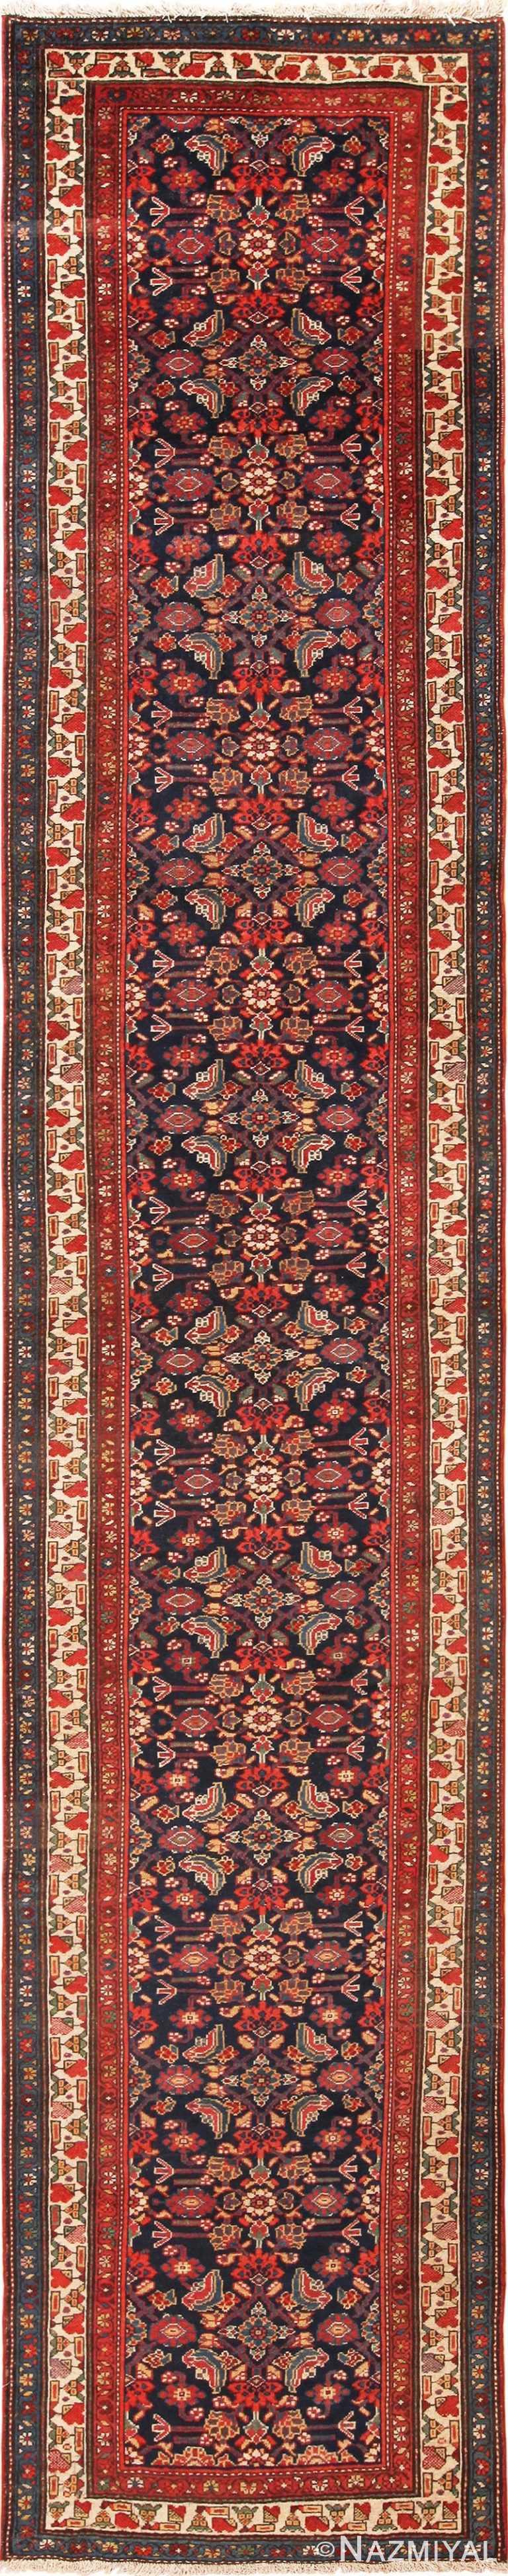 Full Antique Persian Malayer rug 50159 by Nazmiyal